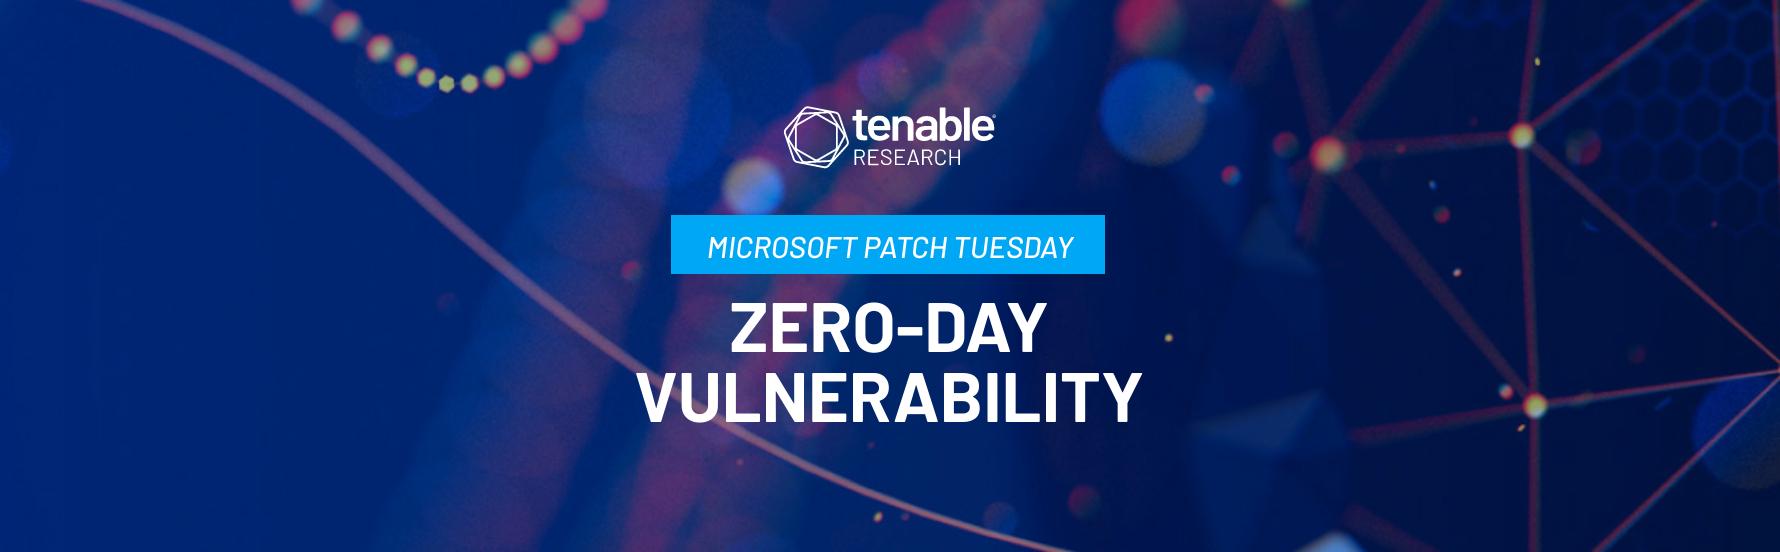 Microsoft's August 2021 Patch Tuesday Addresses 44 CVEs (CVE-2021-26424, CVE-2021-36948)